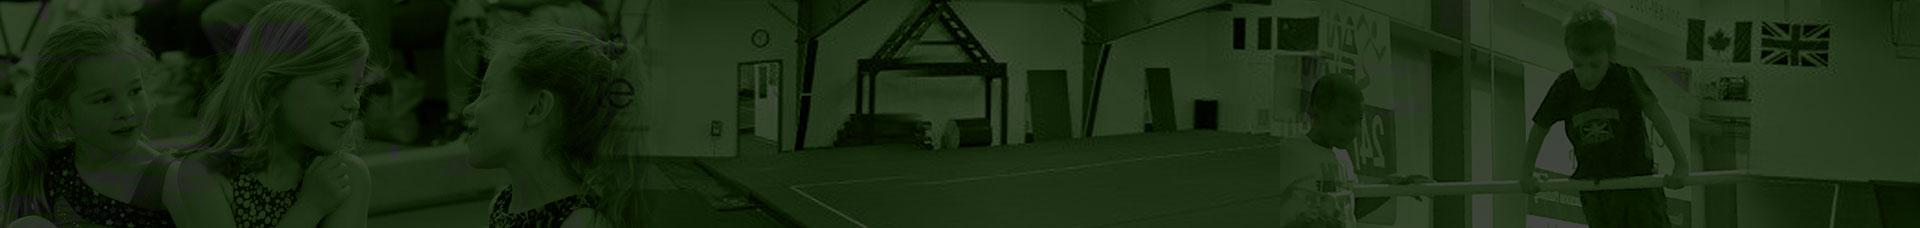 Peoria Elite Gymnastics Academy